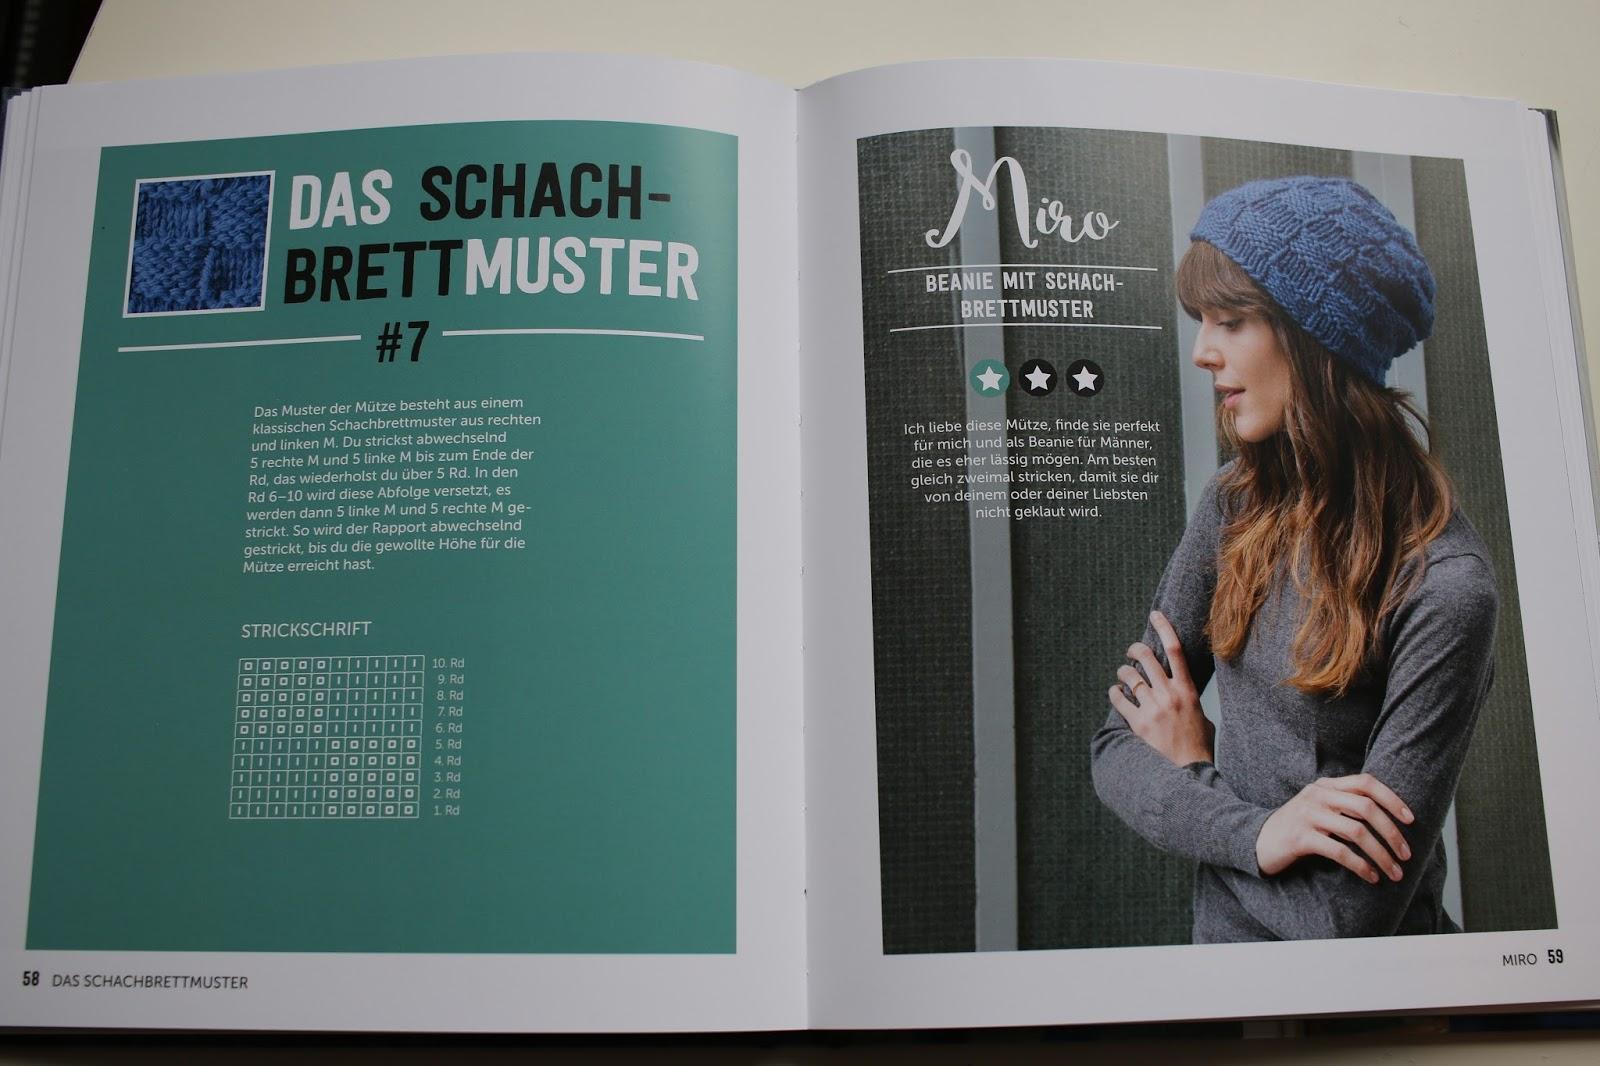 Krumme Naht: Ins Buch geschaut: Einfach Muster stricken von Miezi Berlin